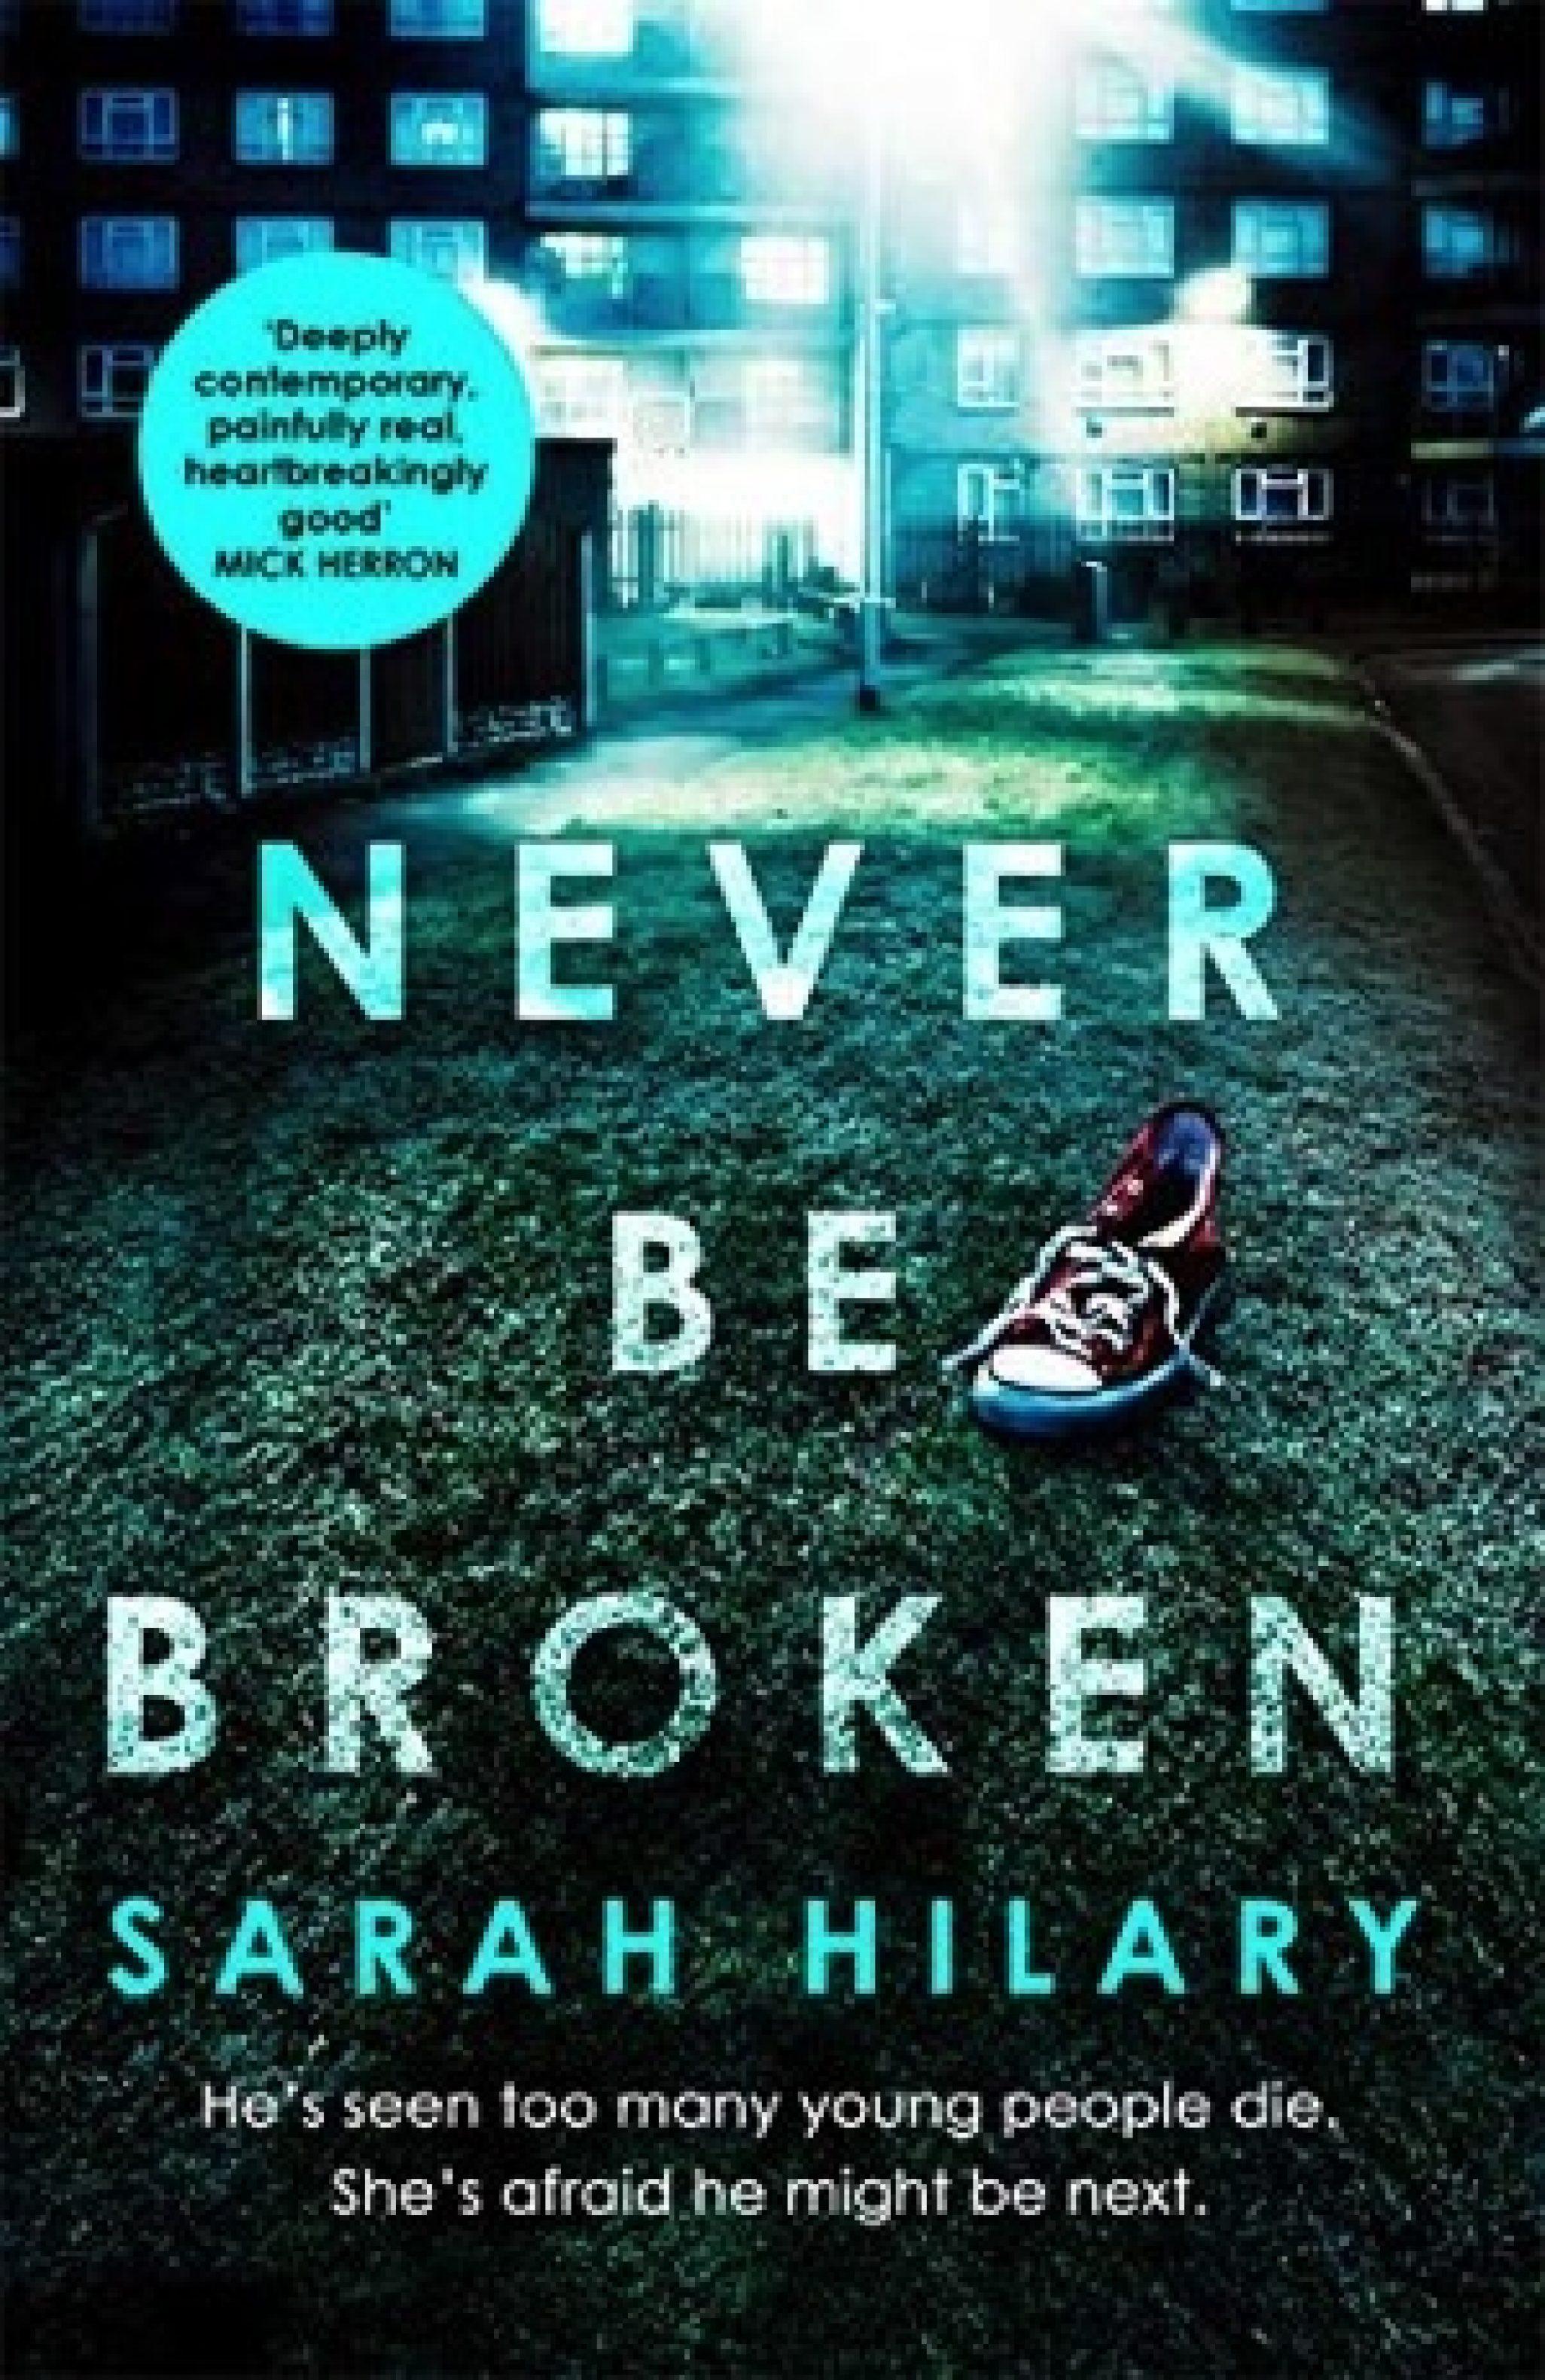 Bestsellers W/C 27th May